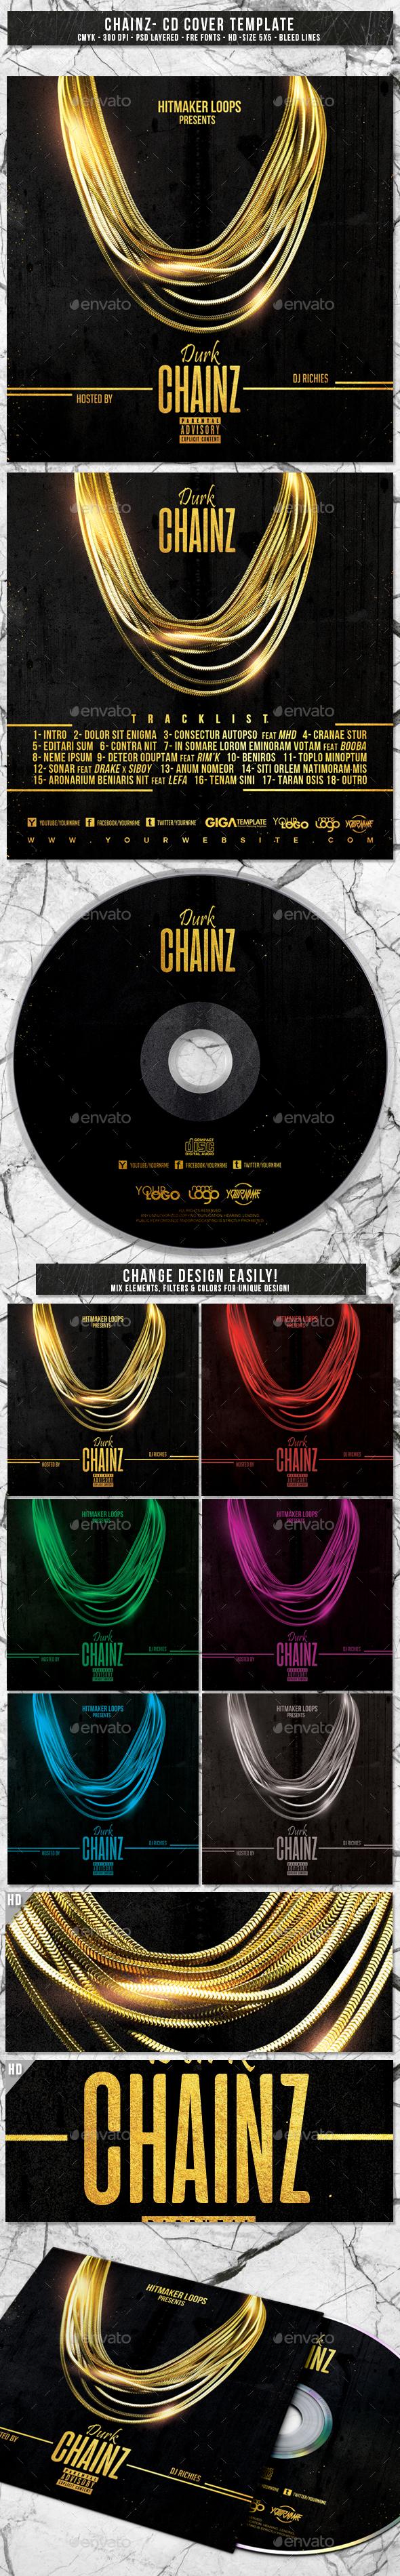 Chainz | Album CD Mixtape Cover Template - CD & DVD Artwork Print Templates